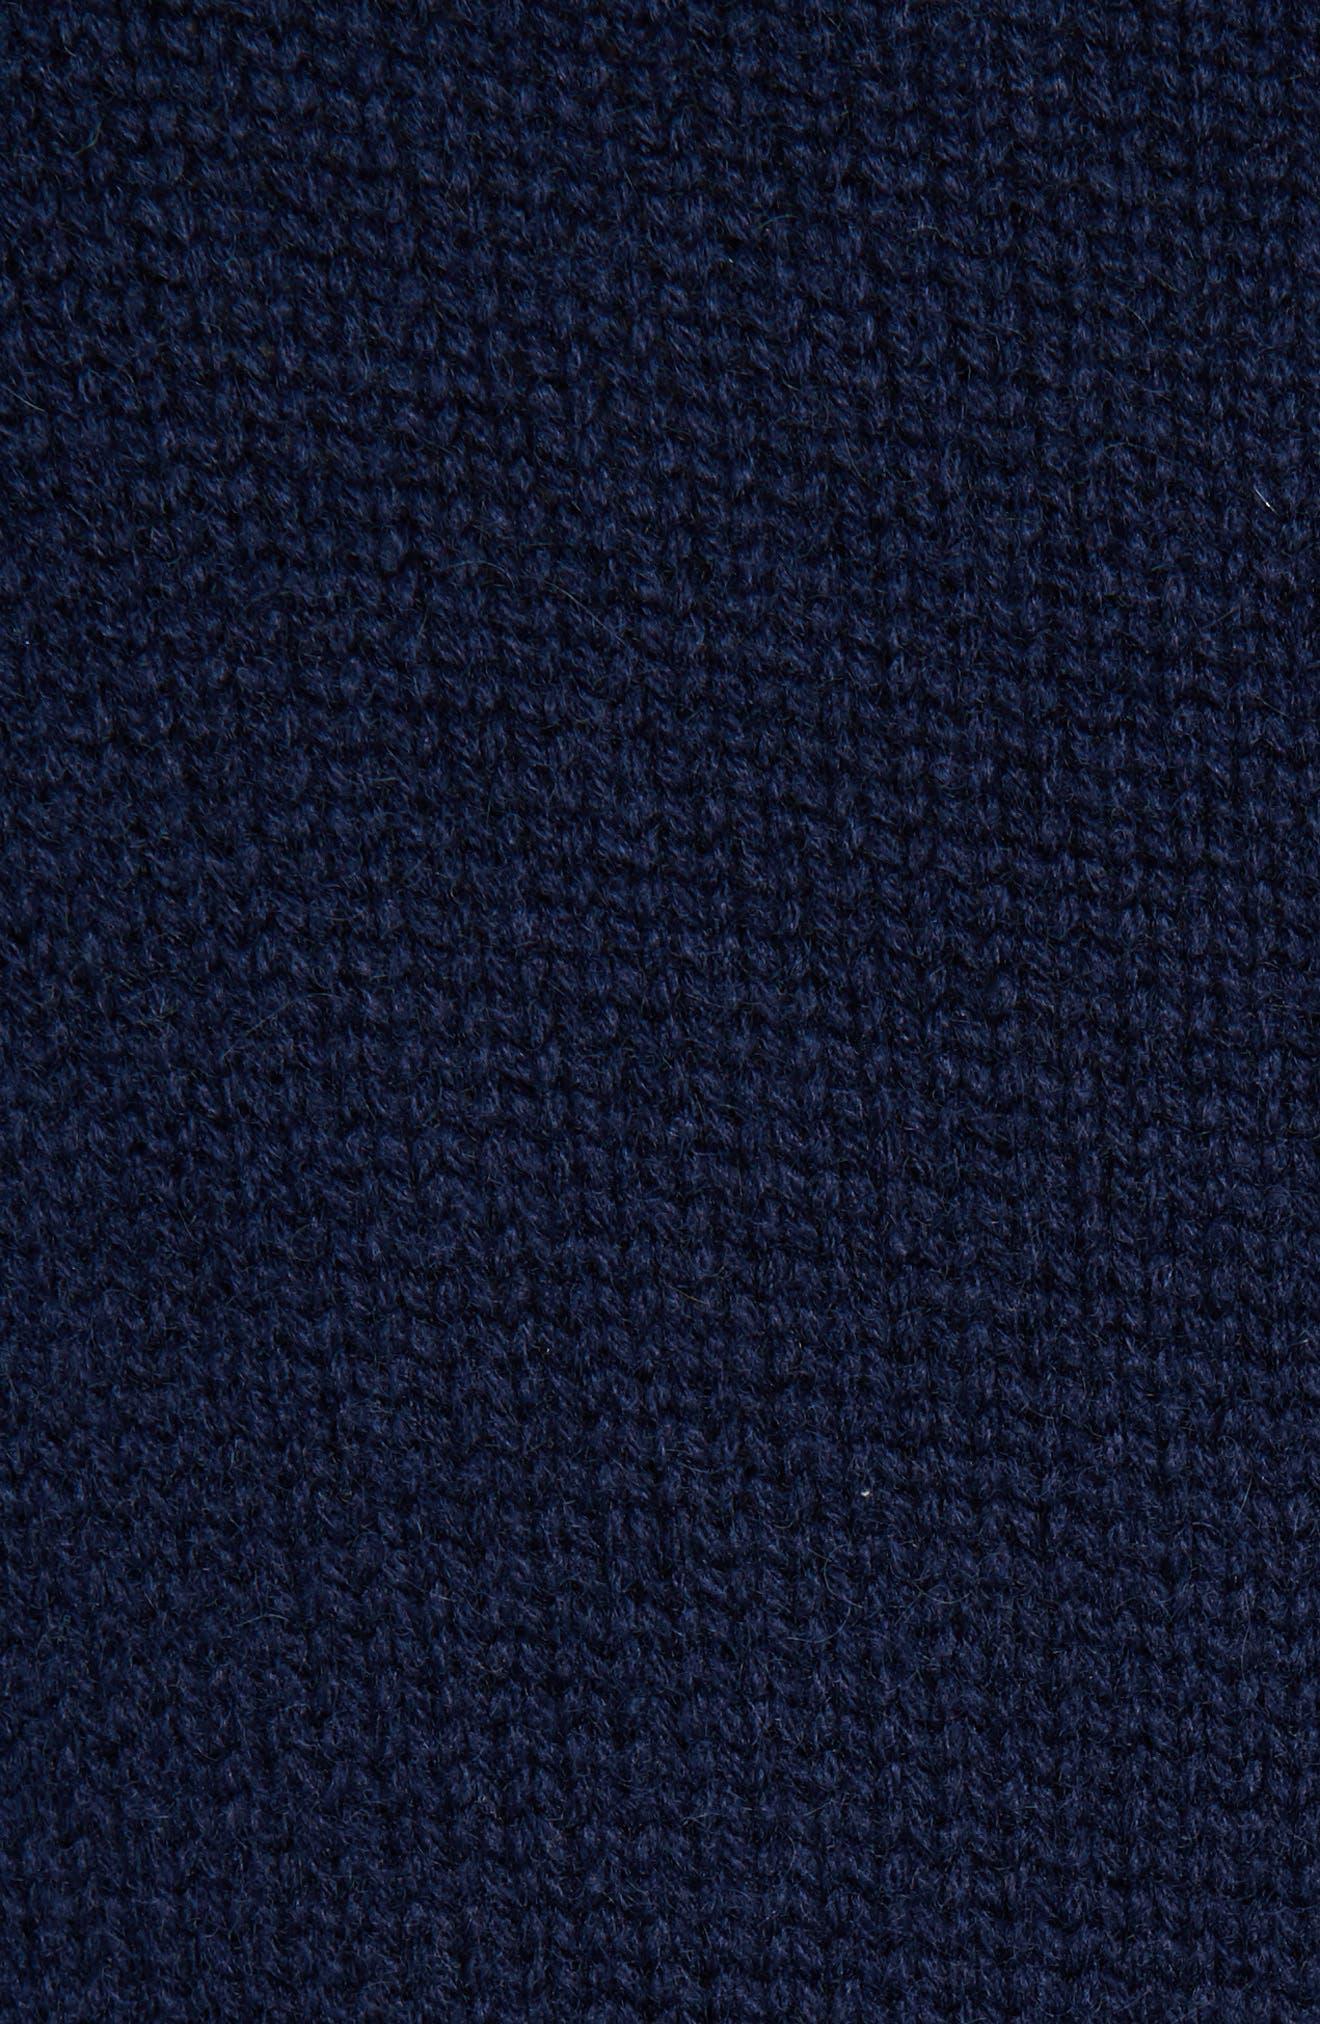 Side Slit Cashmere Sweater,                             Alternate thumbnail 5, color,                             NAVY MEDIEVAL